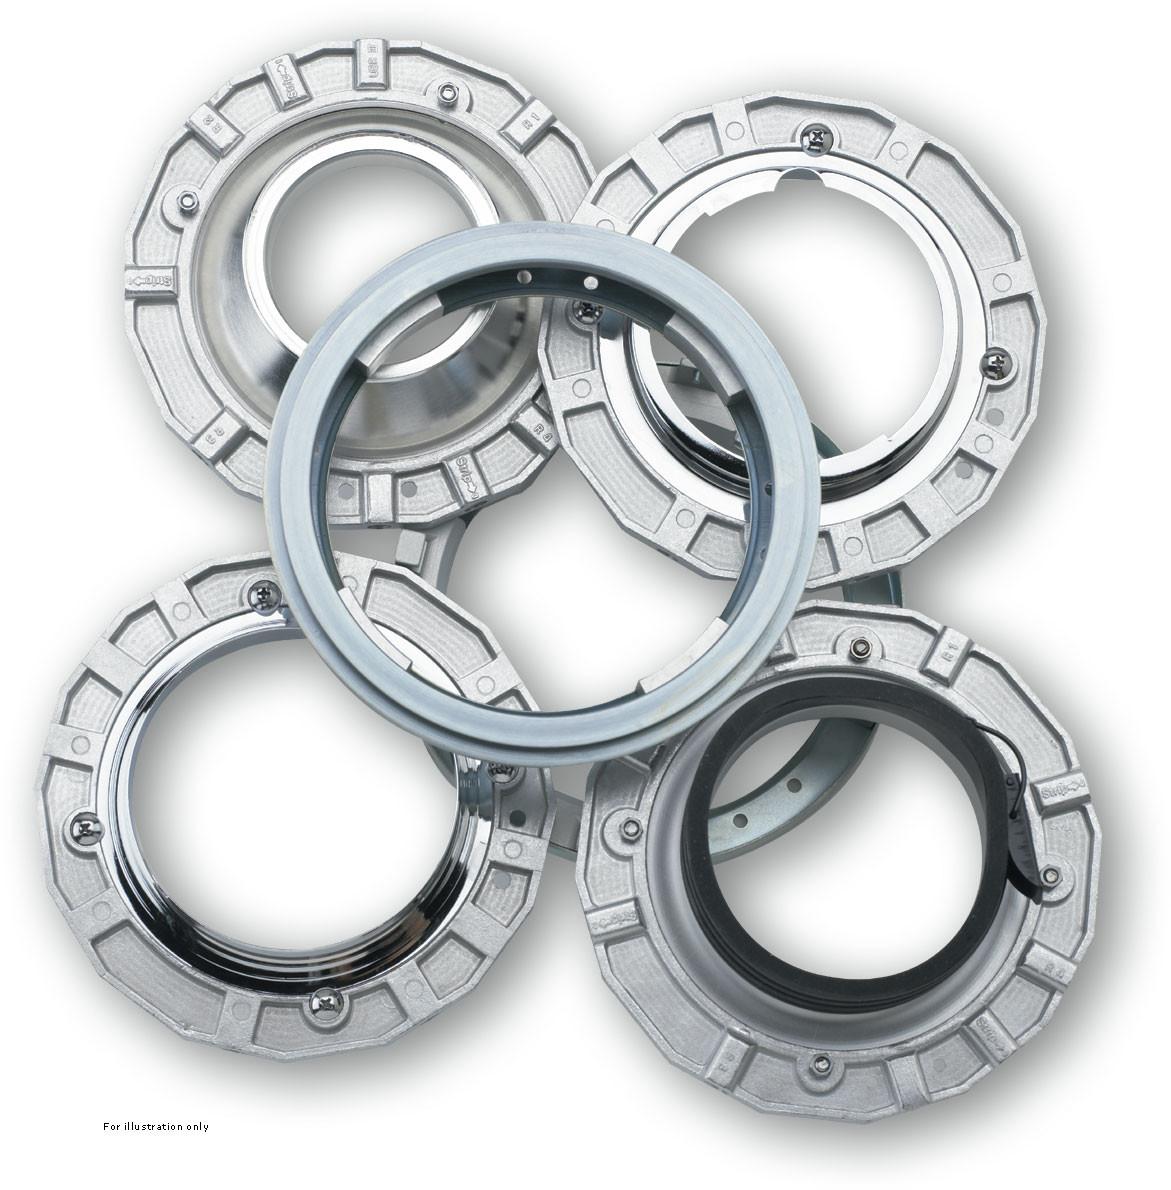 LTM Speed Ring for Cinespace, Cinepar, Prolight 125-200W